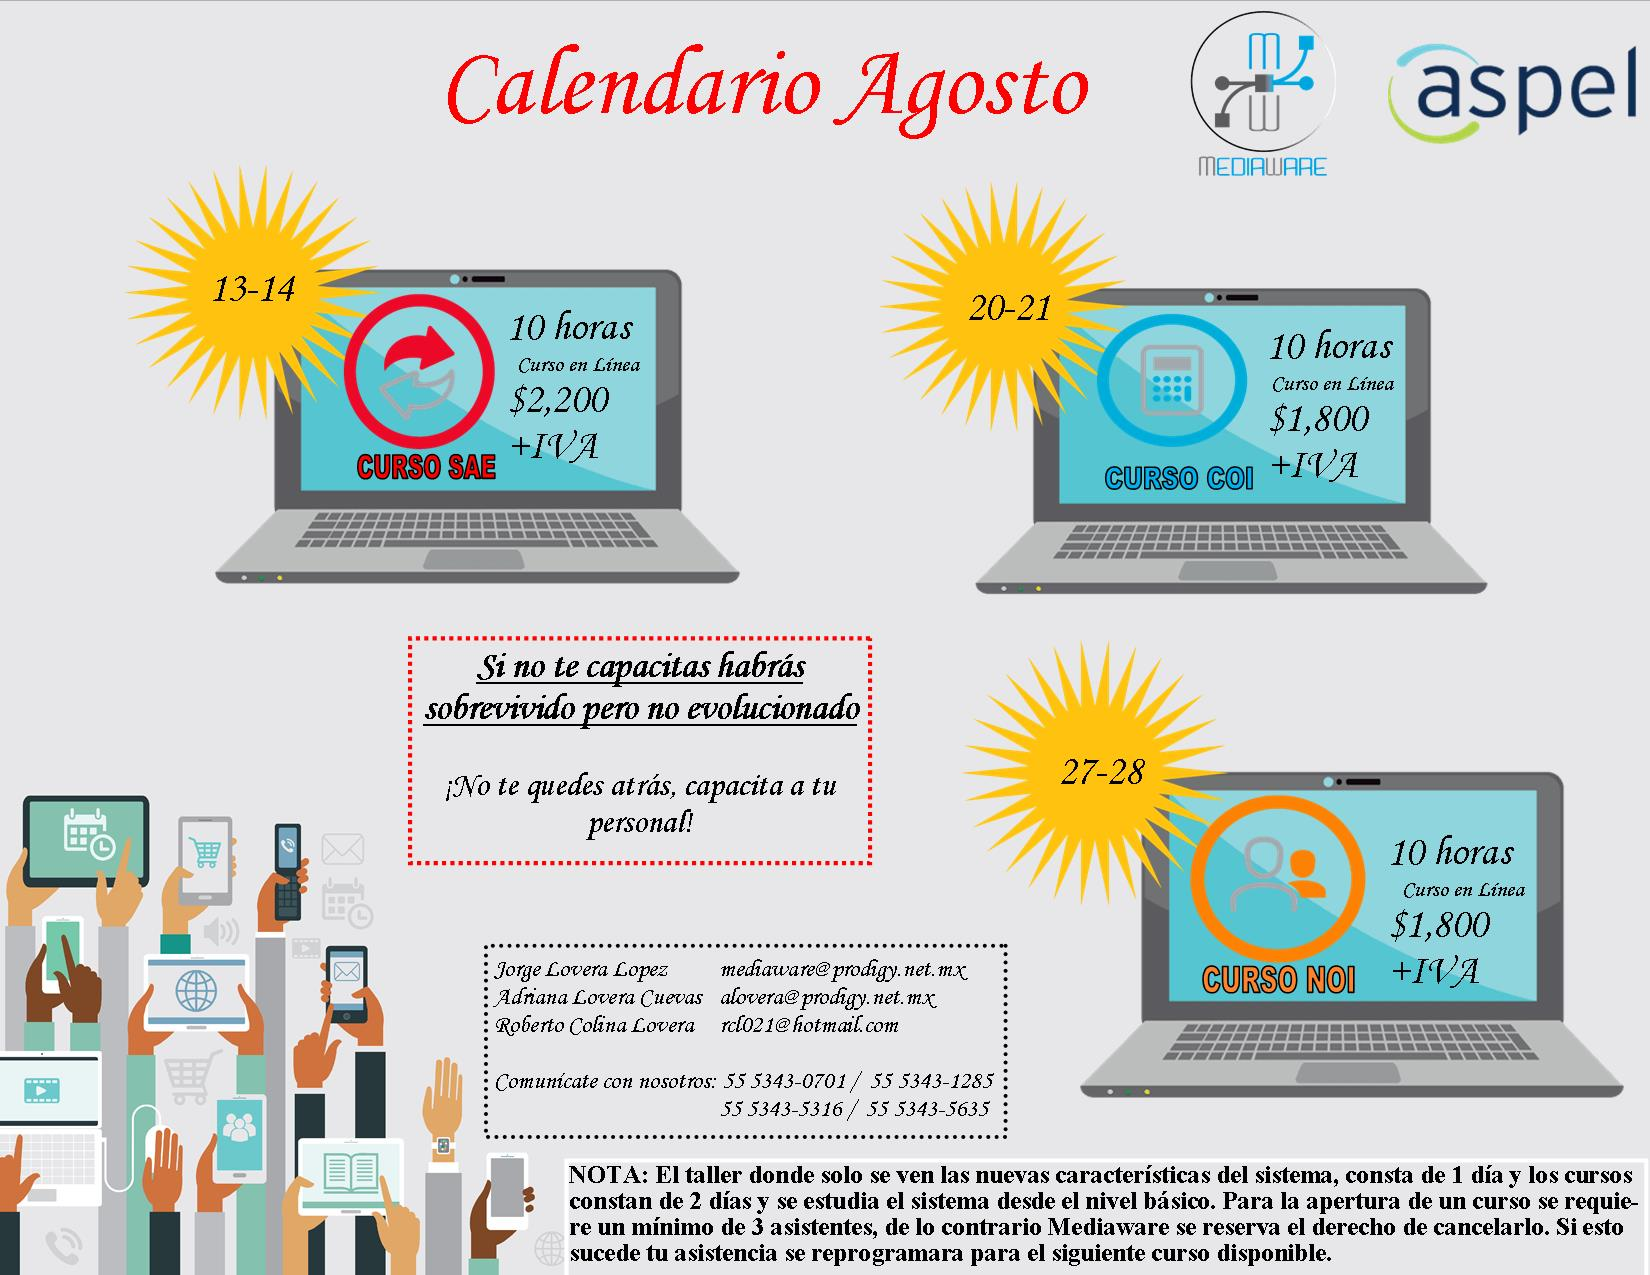 https://0201.nccdn.net/1_2/000/000/0b3/4ff/calendarioagosto.jpg